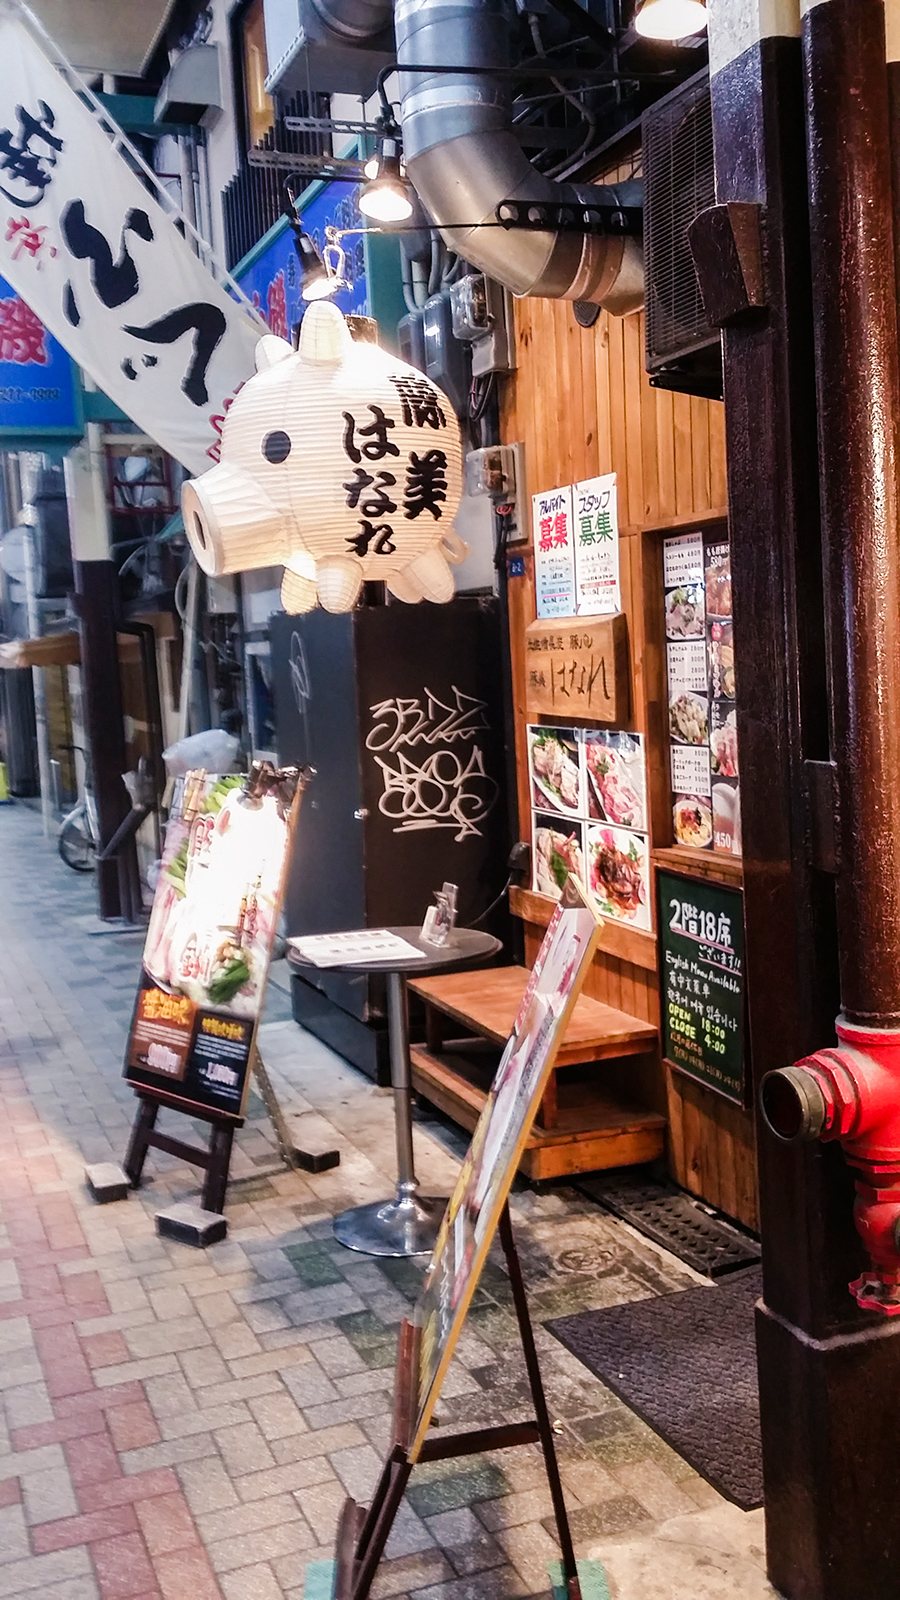 Pig chōchin lantern hanging outside a food restaurant in Osaka, Japan.